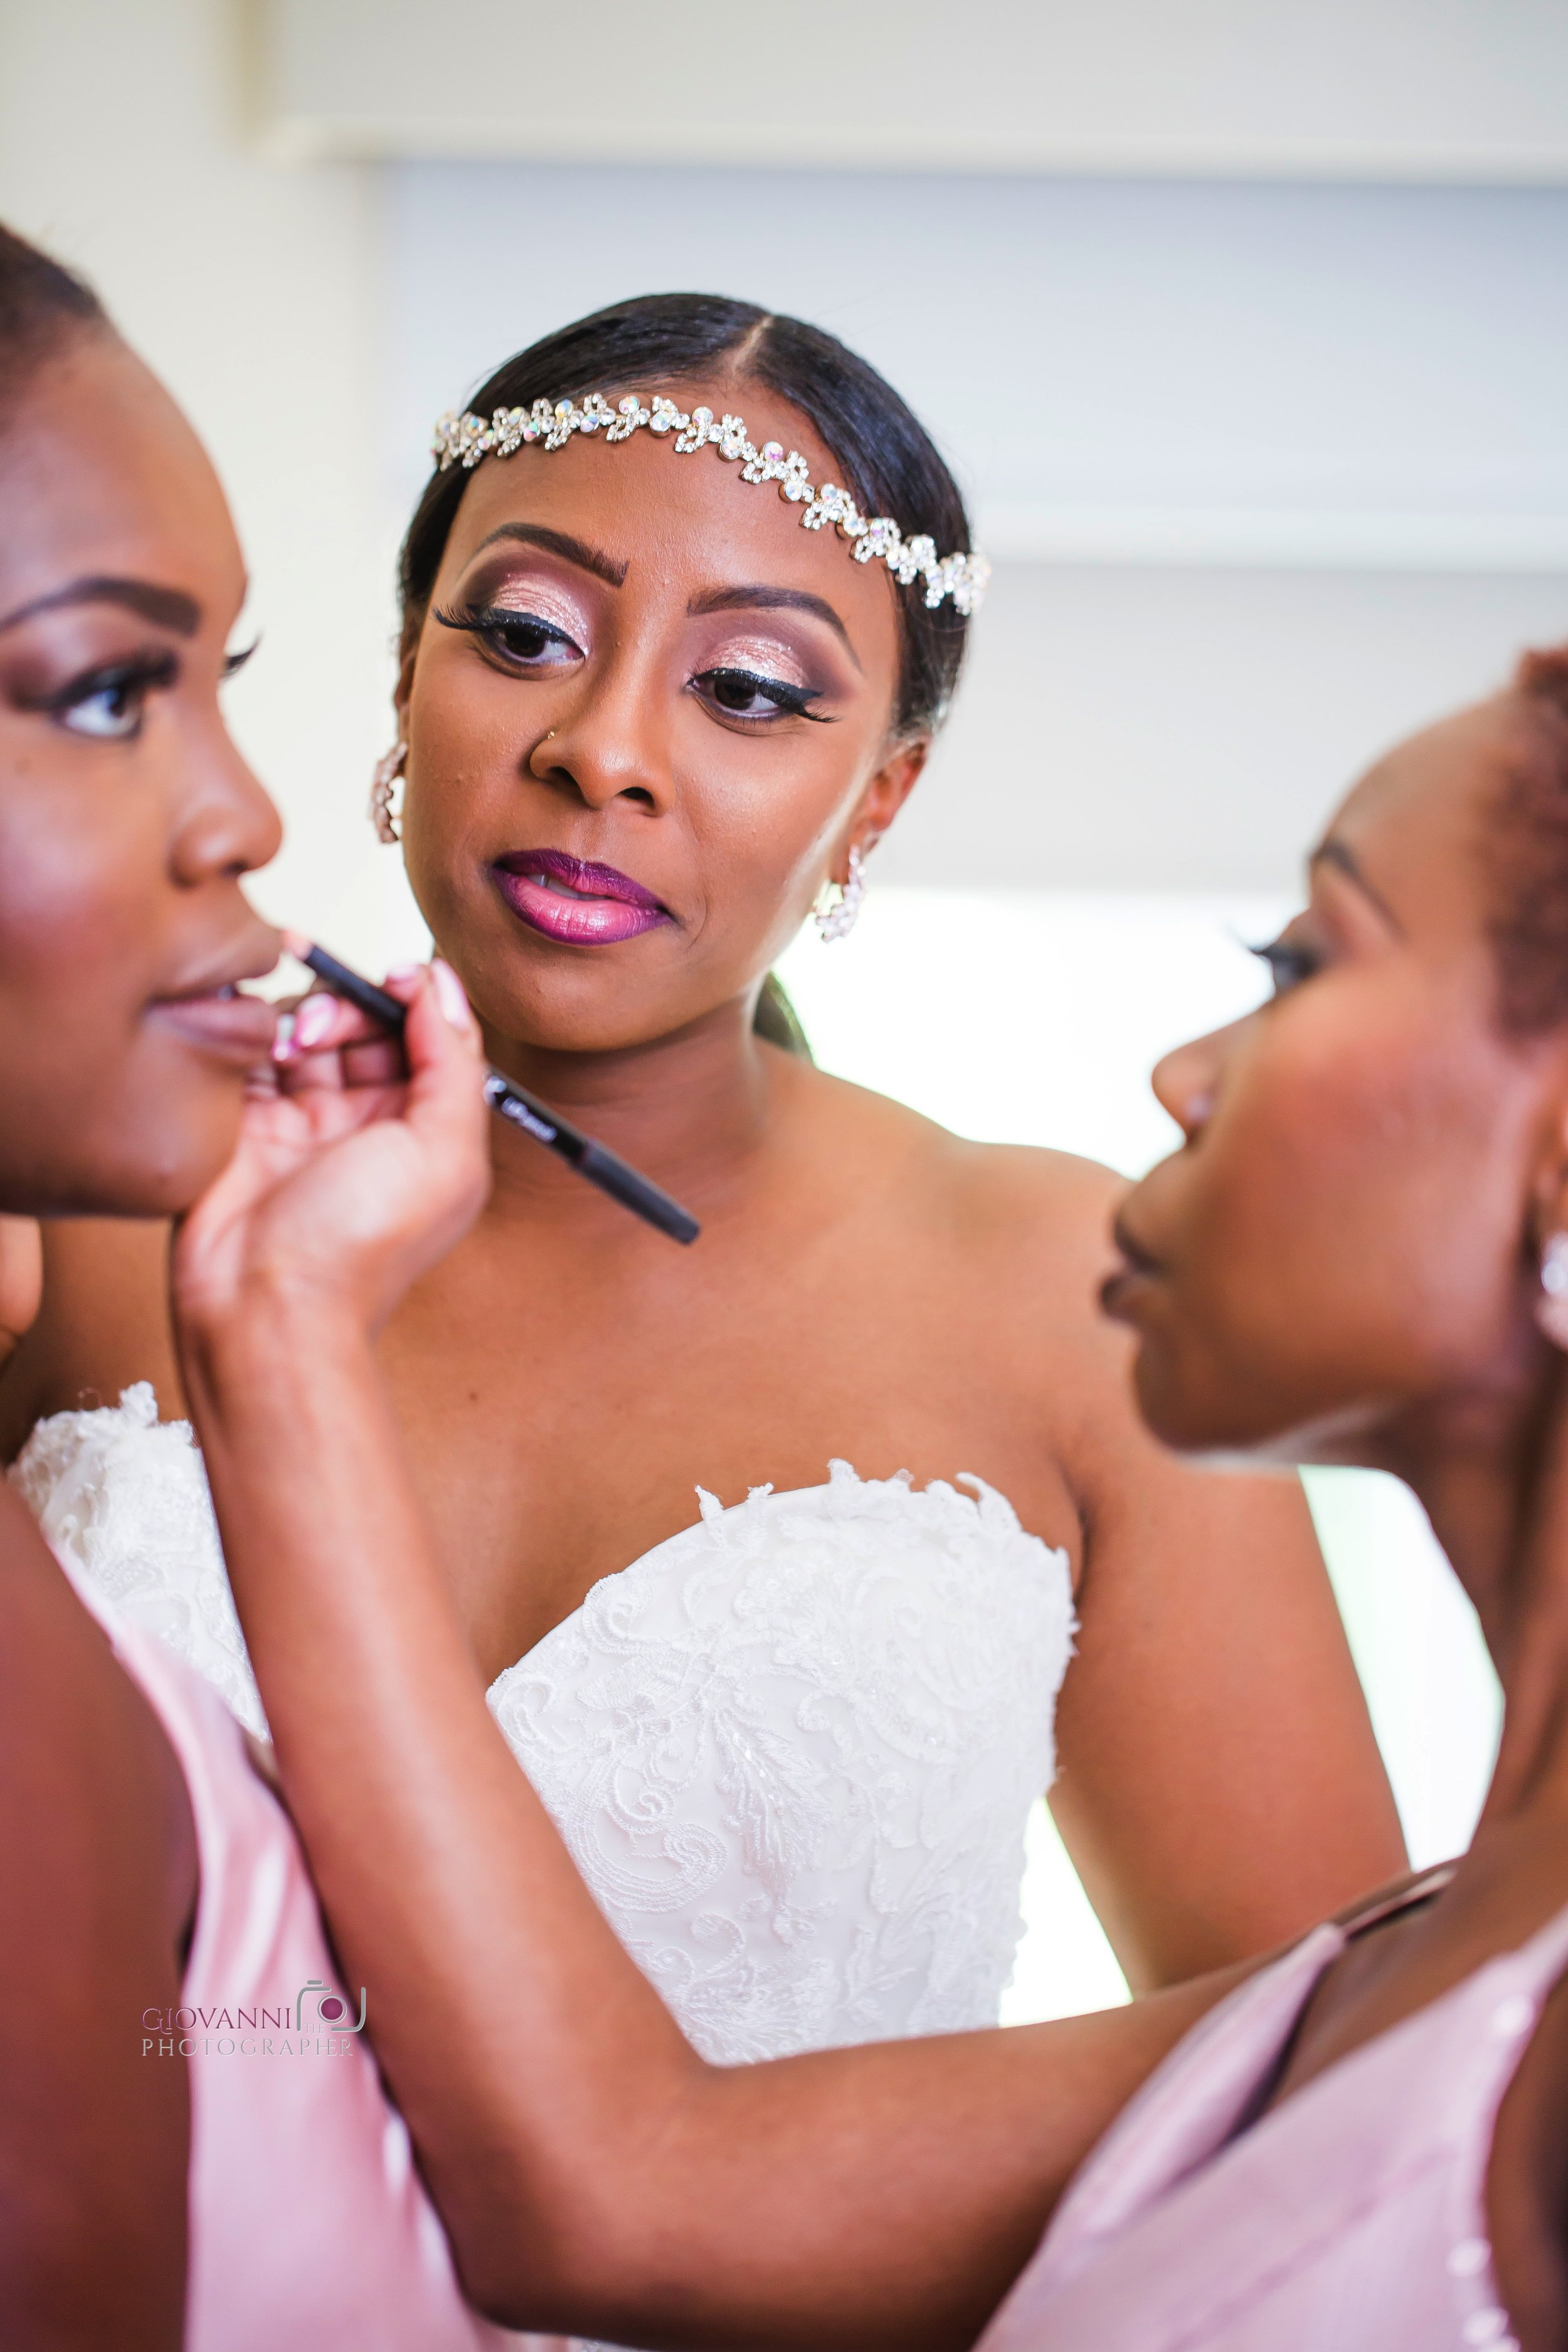 314A0191-Giovanni The Photographer-Best Boston Wedding Photography-Randolph Elks 2130 WM50.jpg